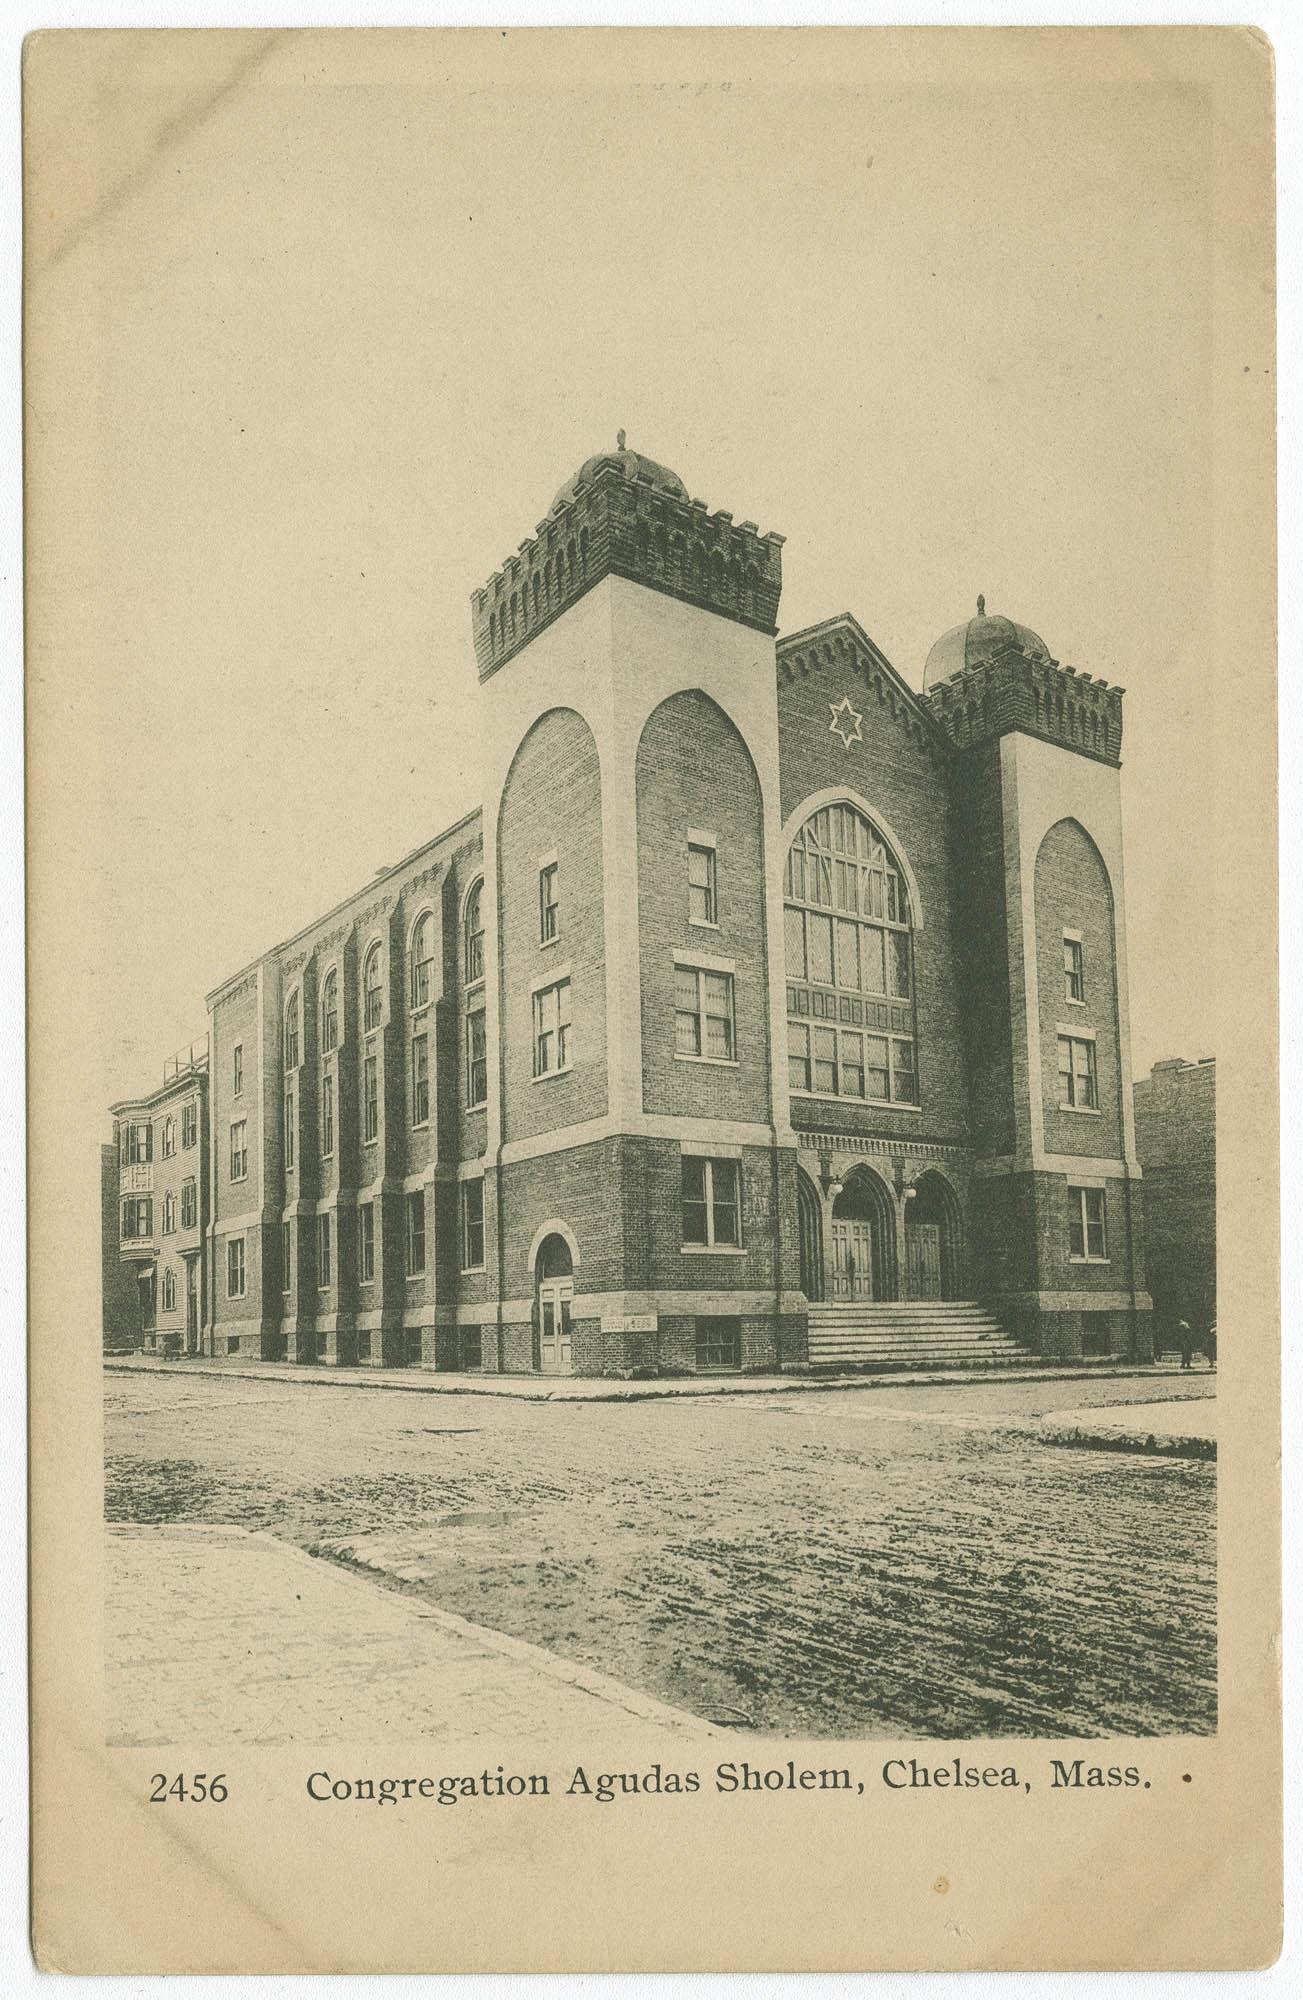 Congregation Agudas Sholem, Chelsea, Mass.